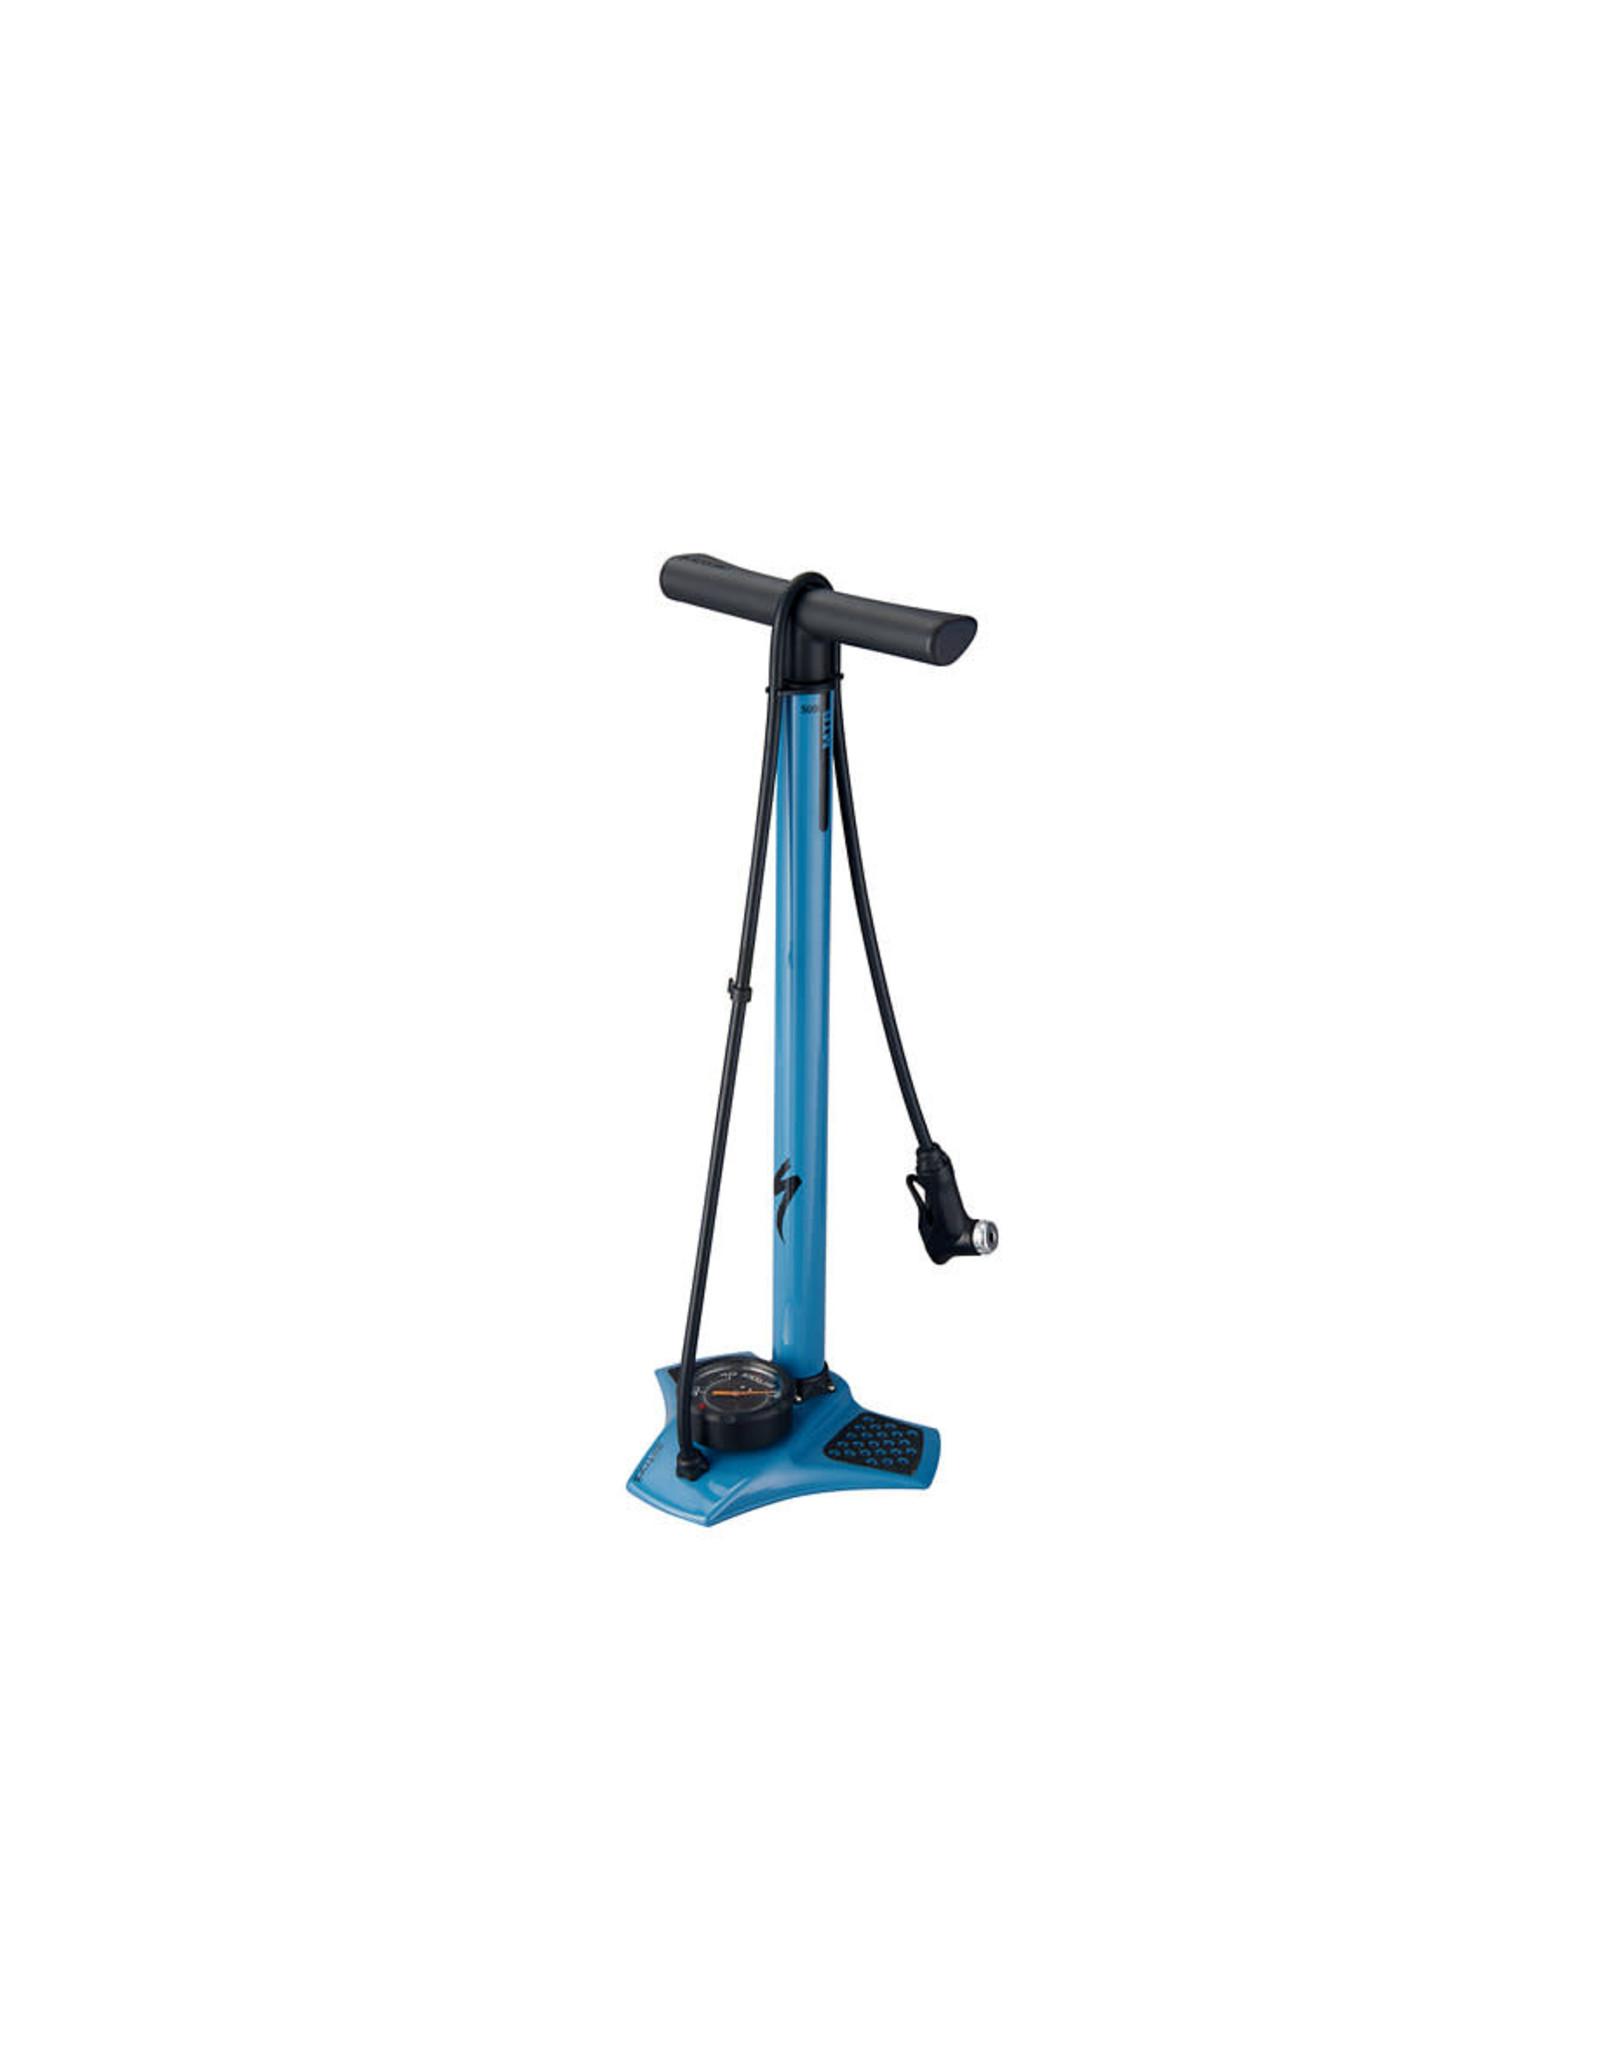 Specialized Bikes AIR TOOL MTB FLR PUMP GRY